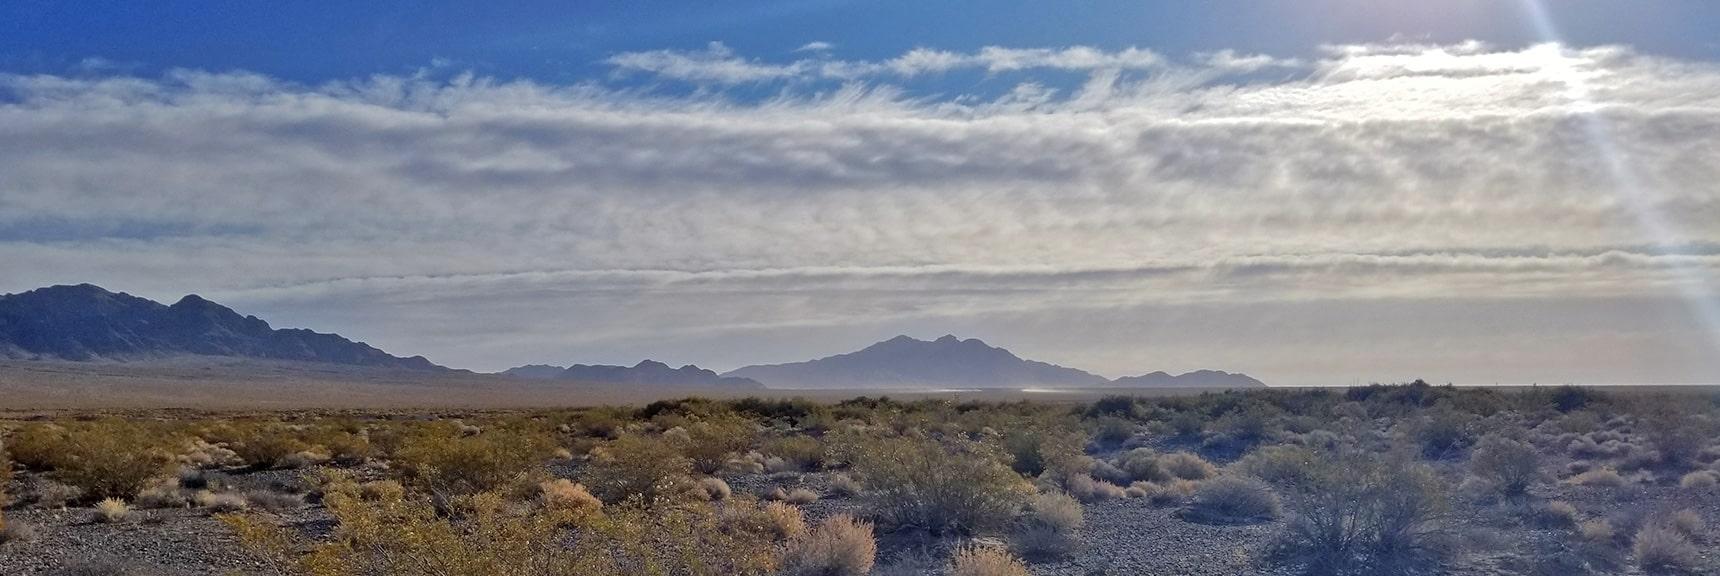 View Back Down Alamo Road Toward the Southern Sheep Range, Fossil Ridge and Gass Peak   Lower Alamo Road   Sheep Range   Desert National Wildlife Refuge, Nevada